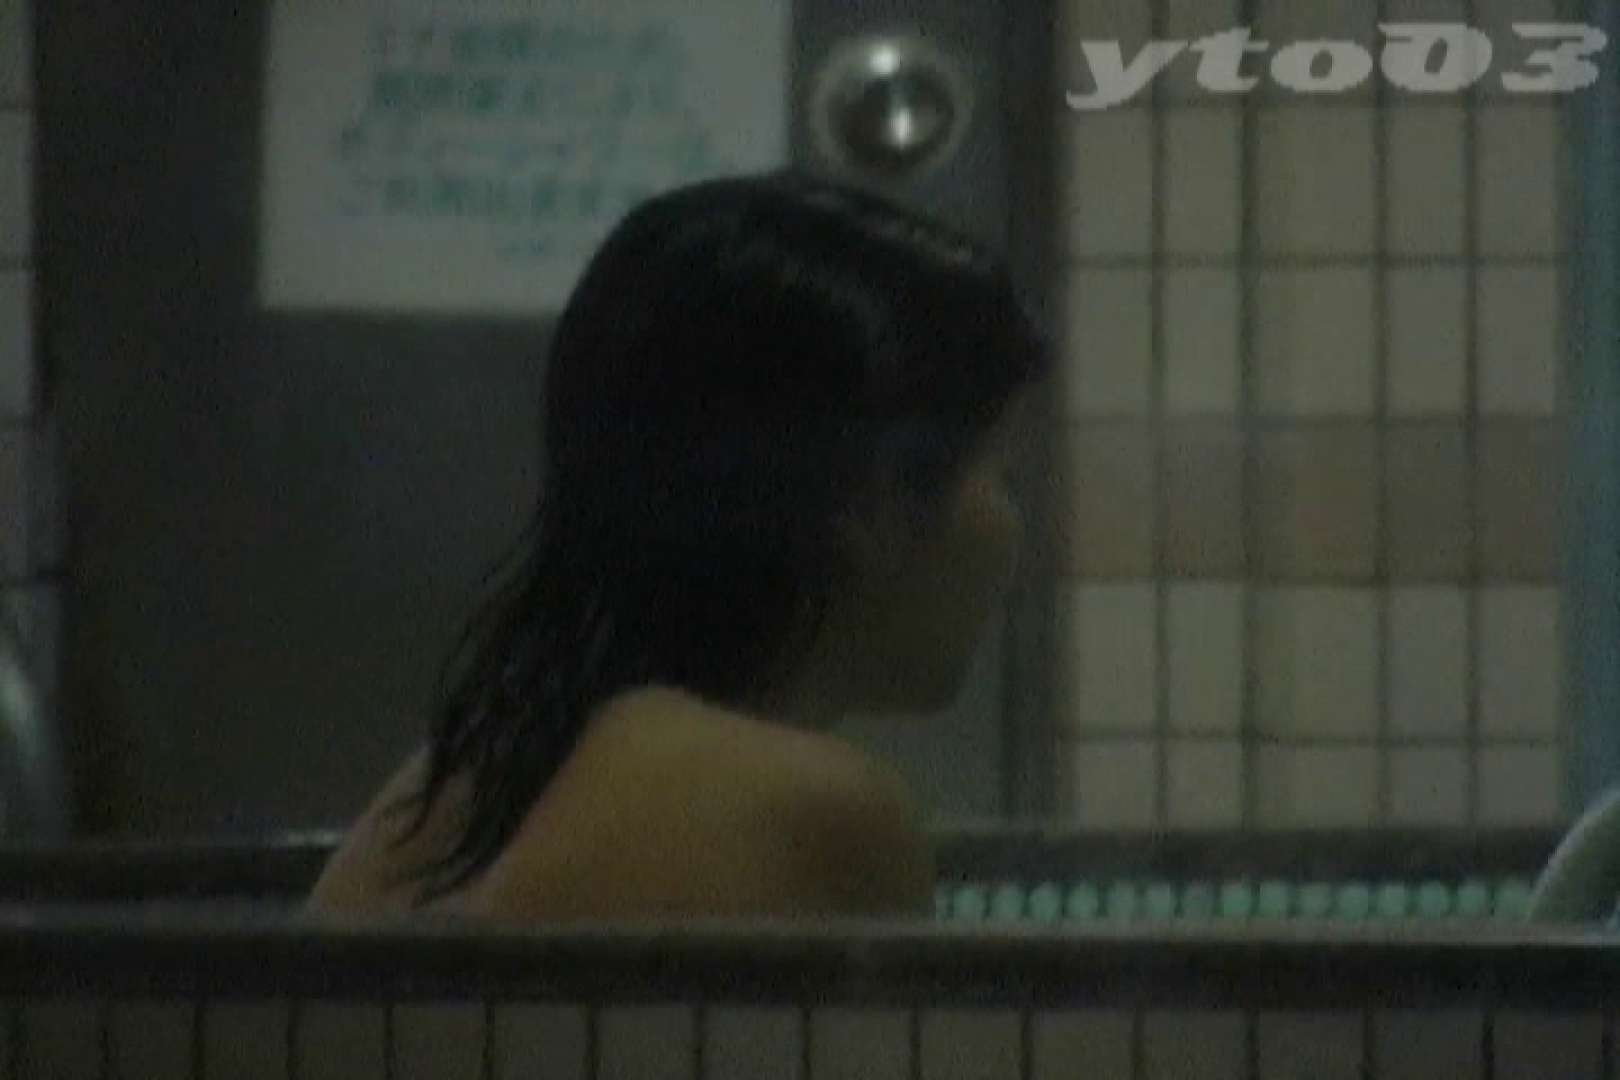 ▲復活限定▲合宿ホテル女風呂盗撮 Vol.17 女湯 スケベ動画紹介 100画像 93